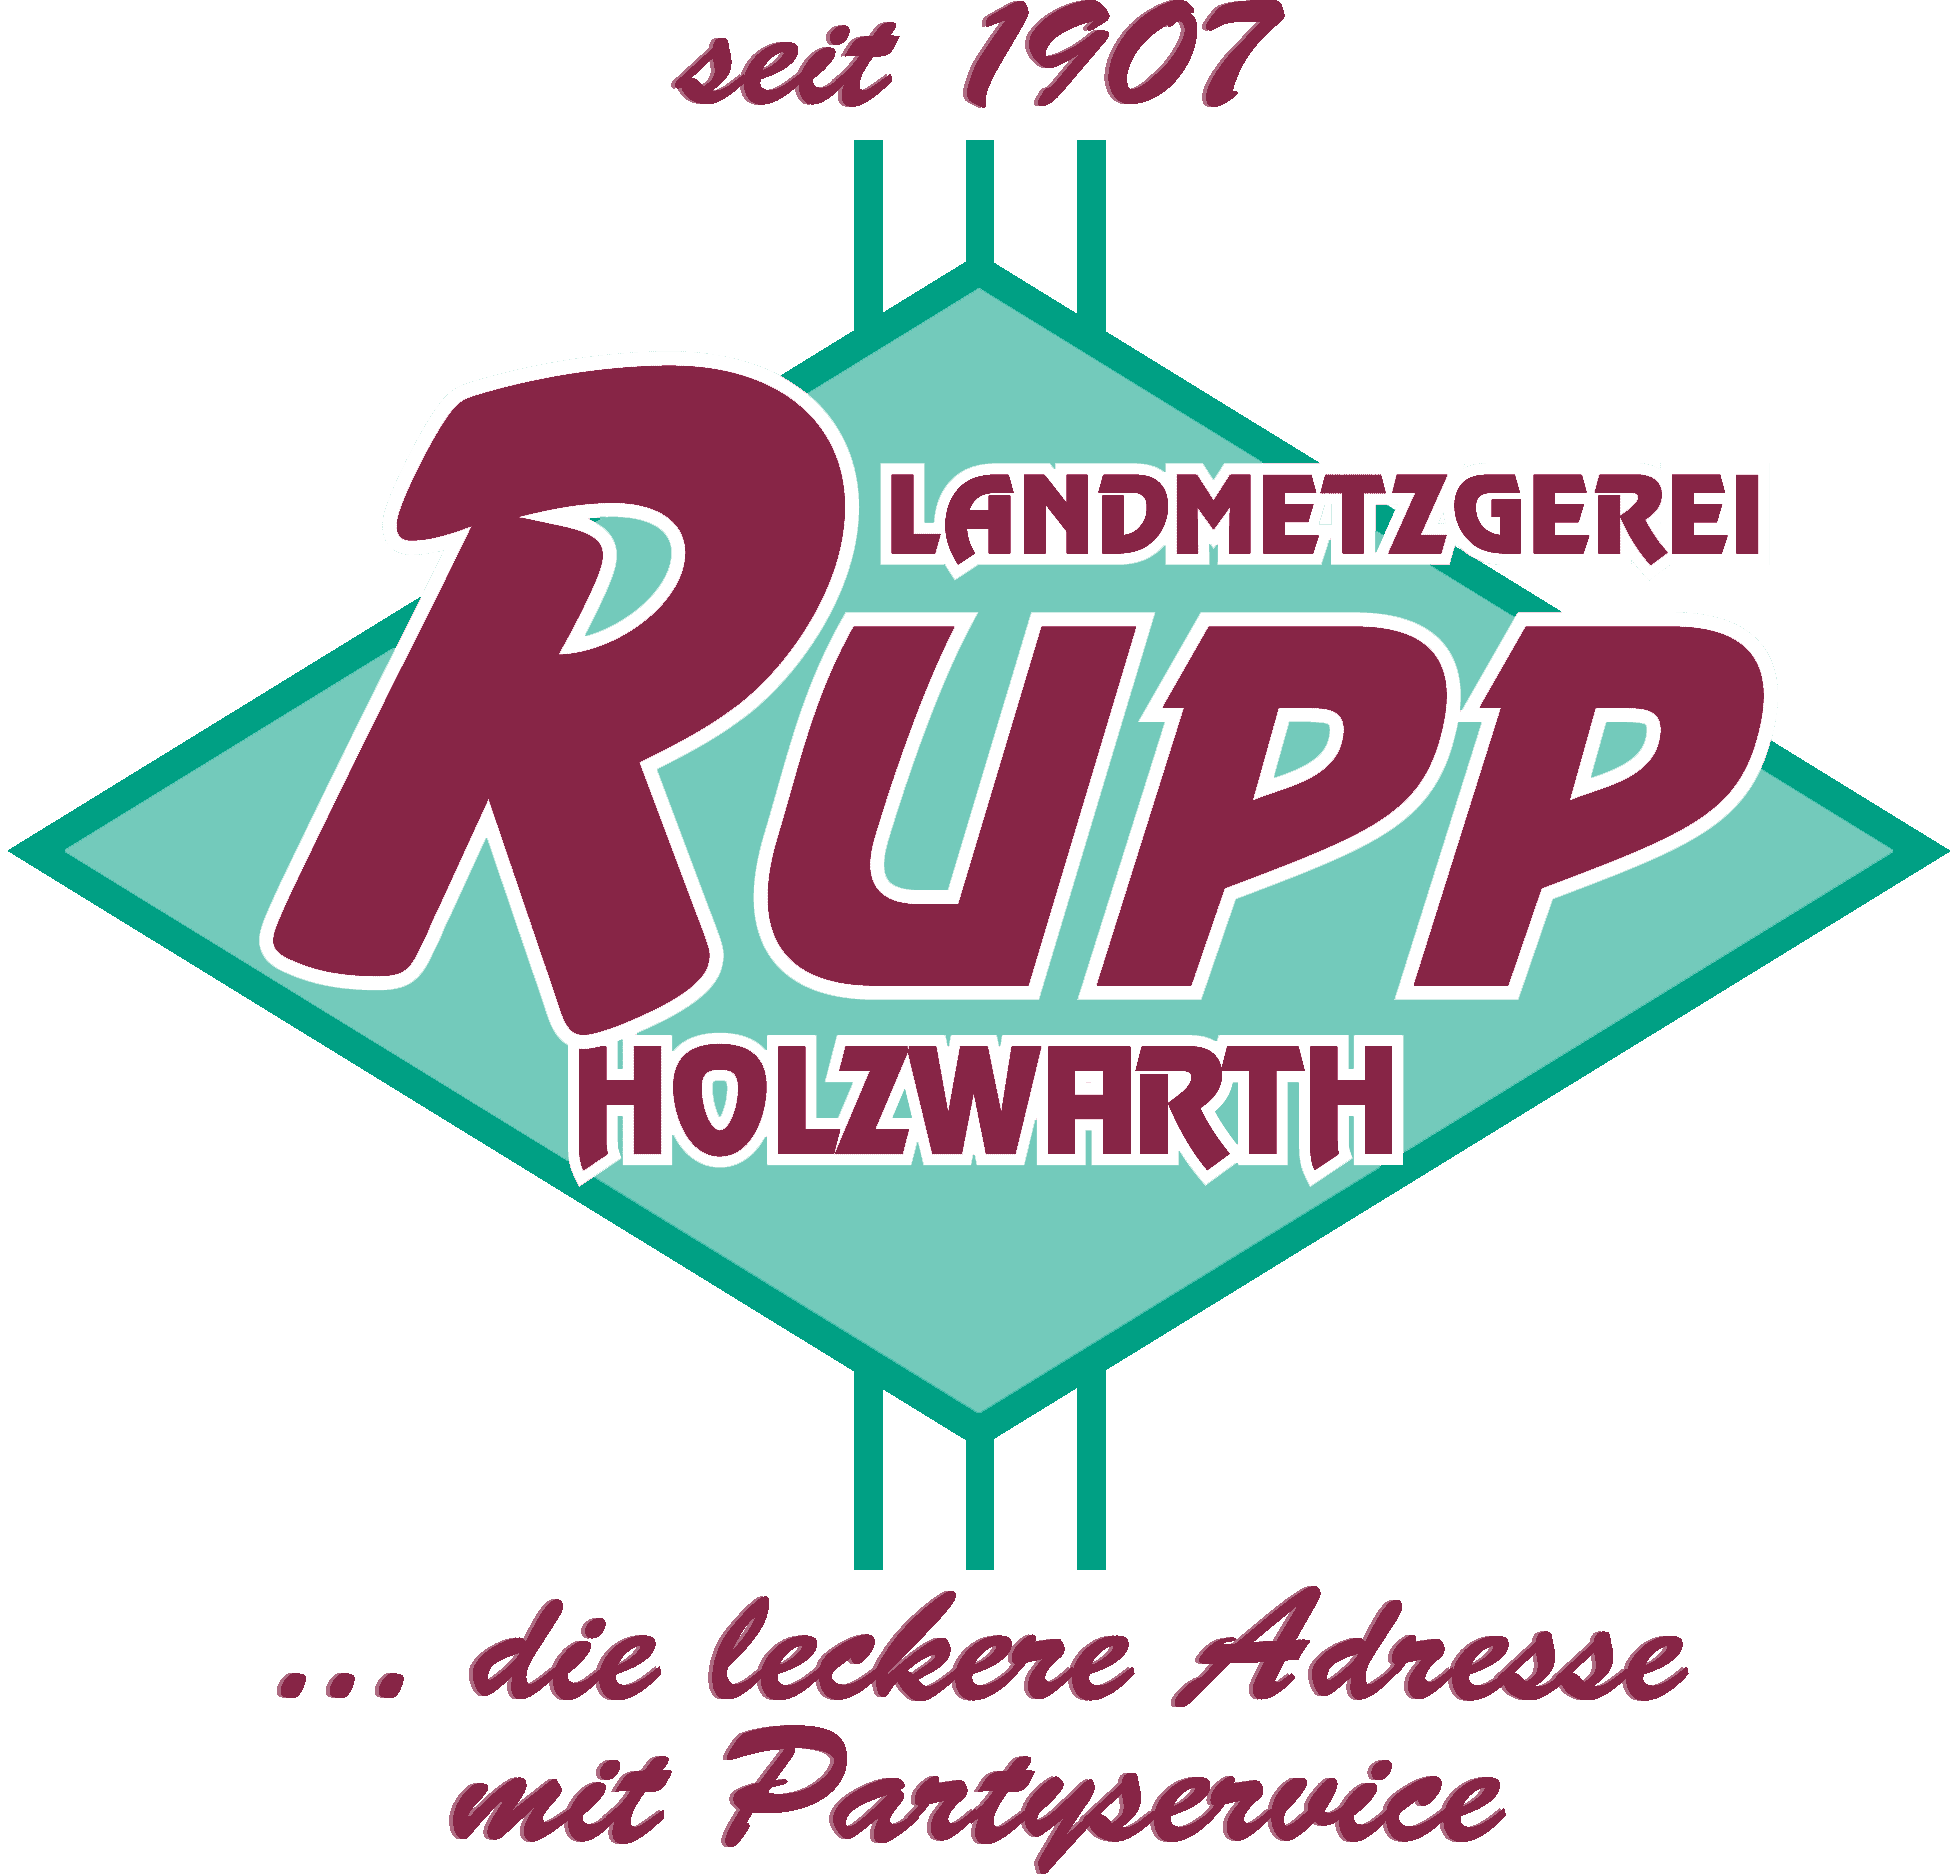 Landmetzgerei Rupp-Holzwarth